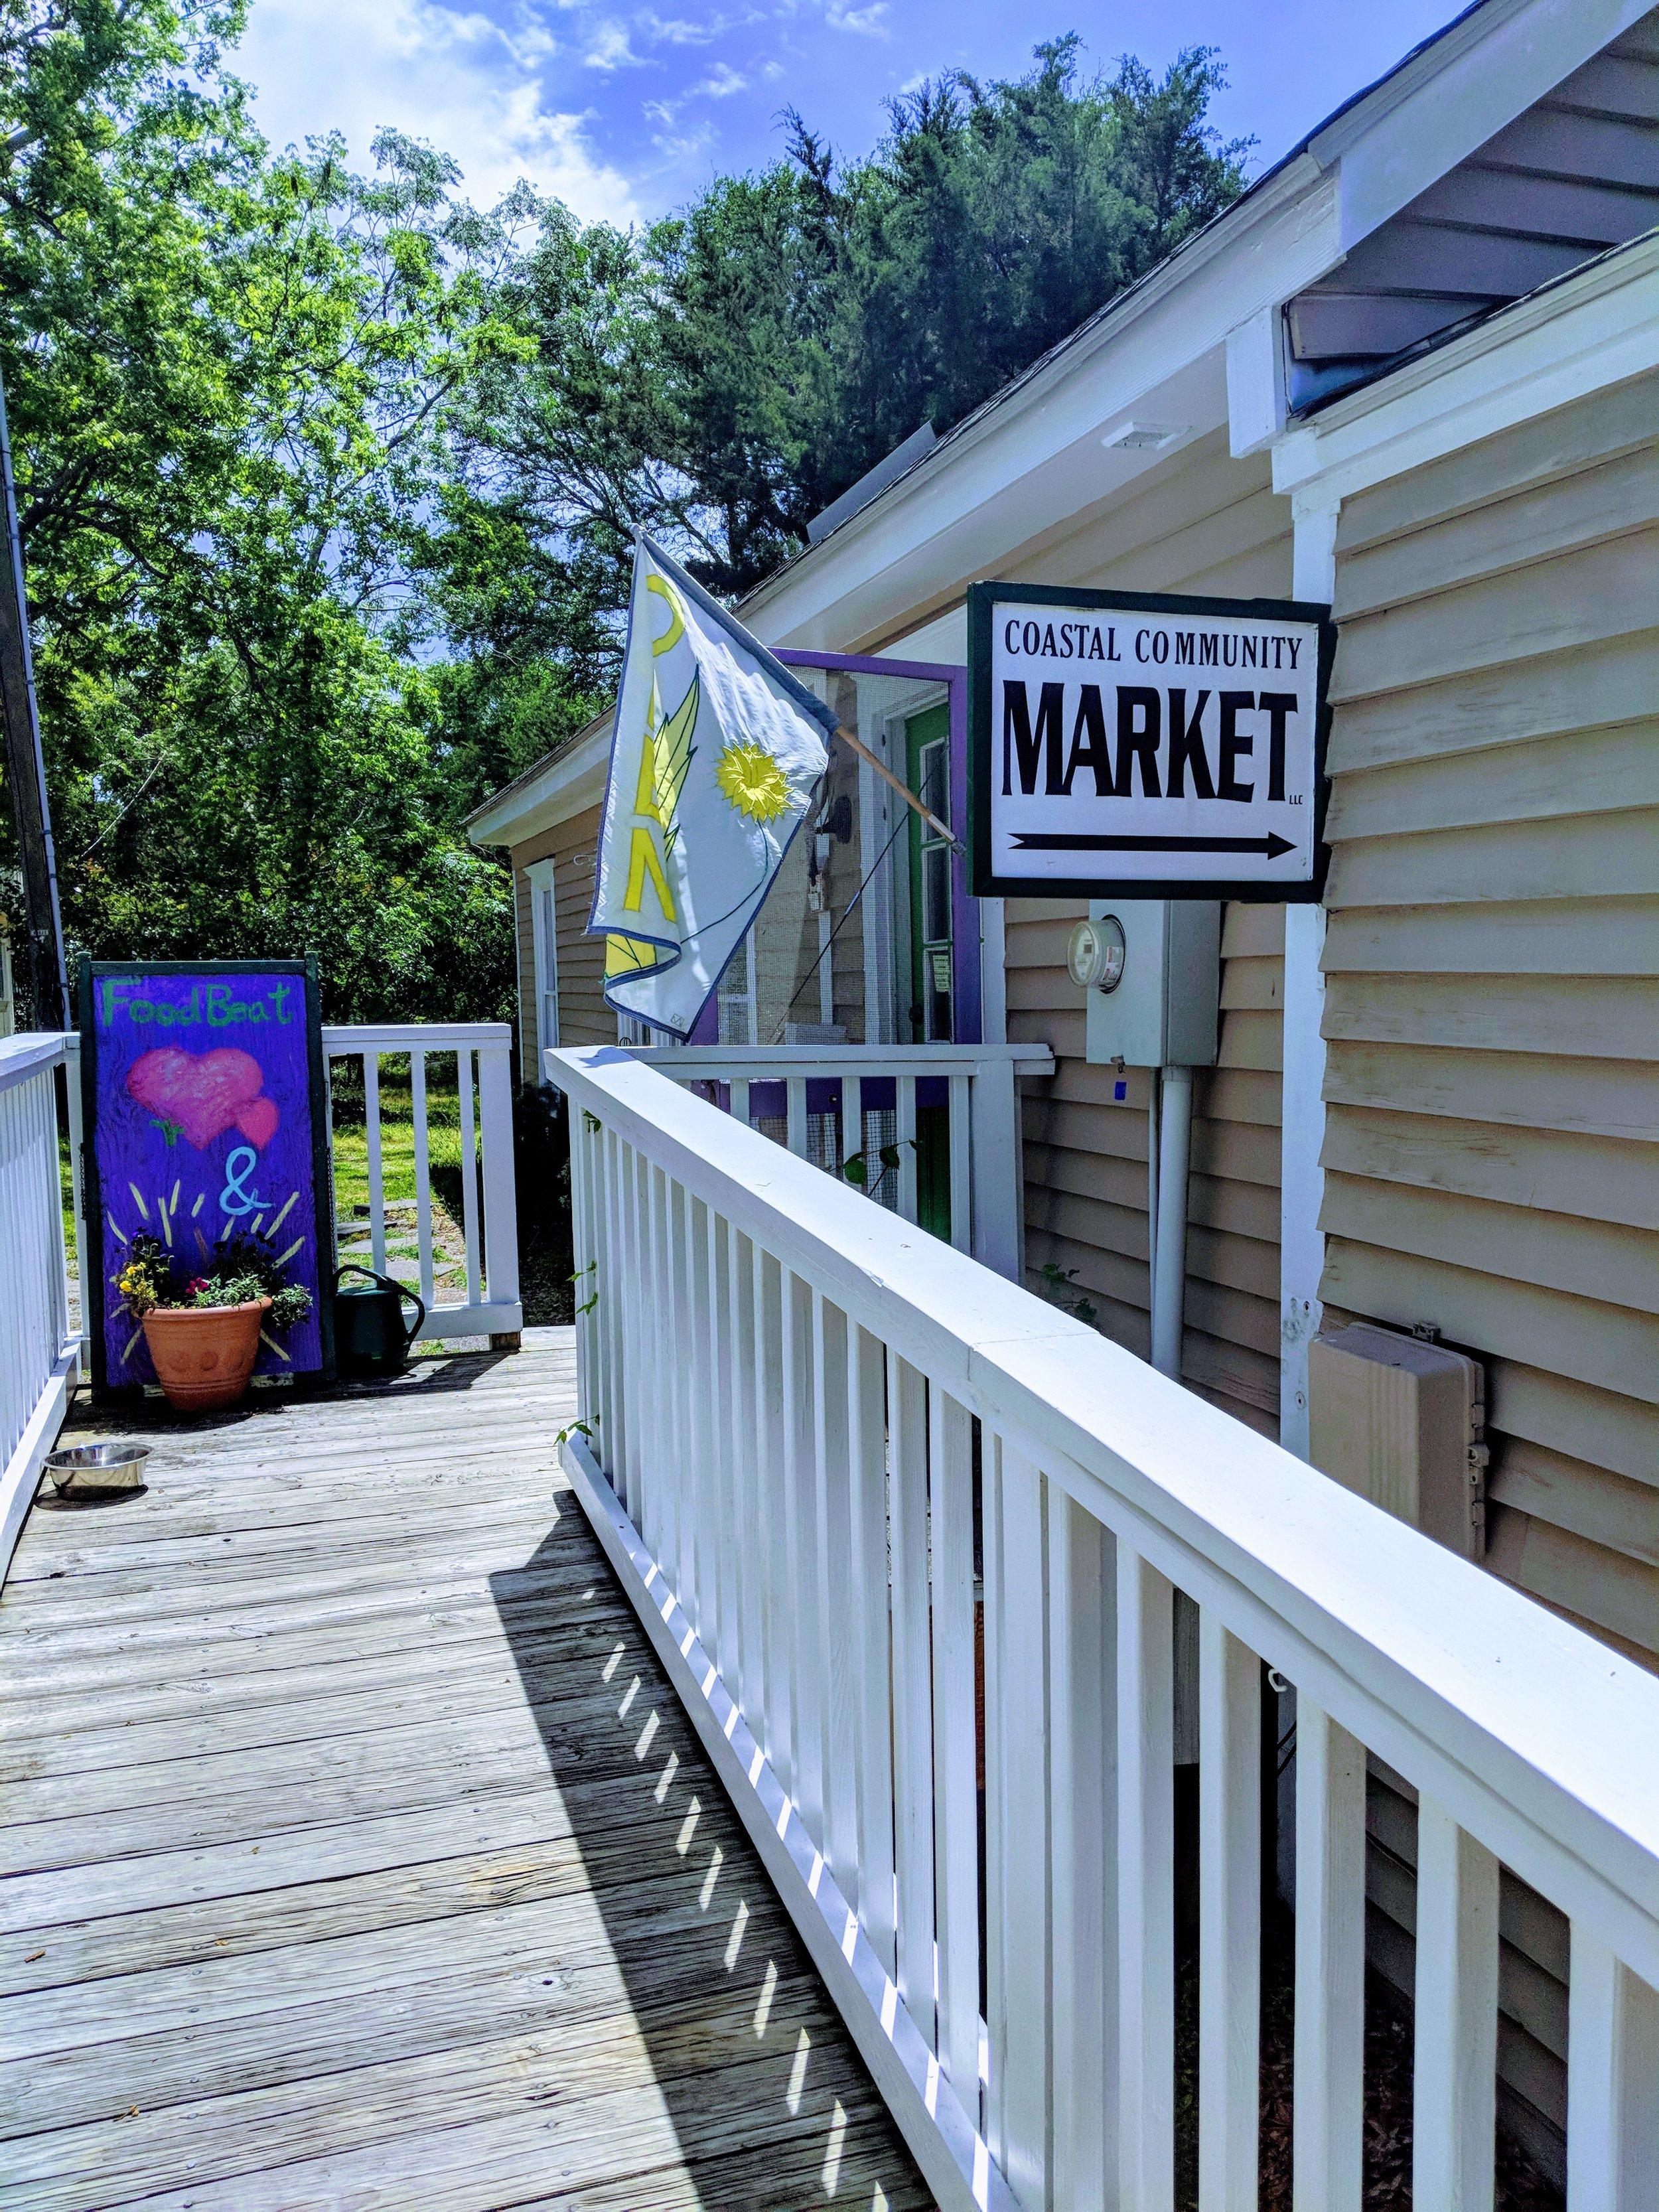 Coastal Community Market